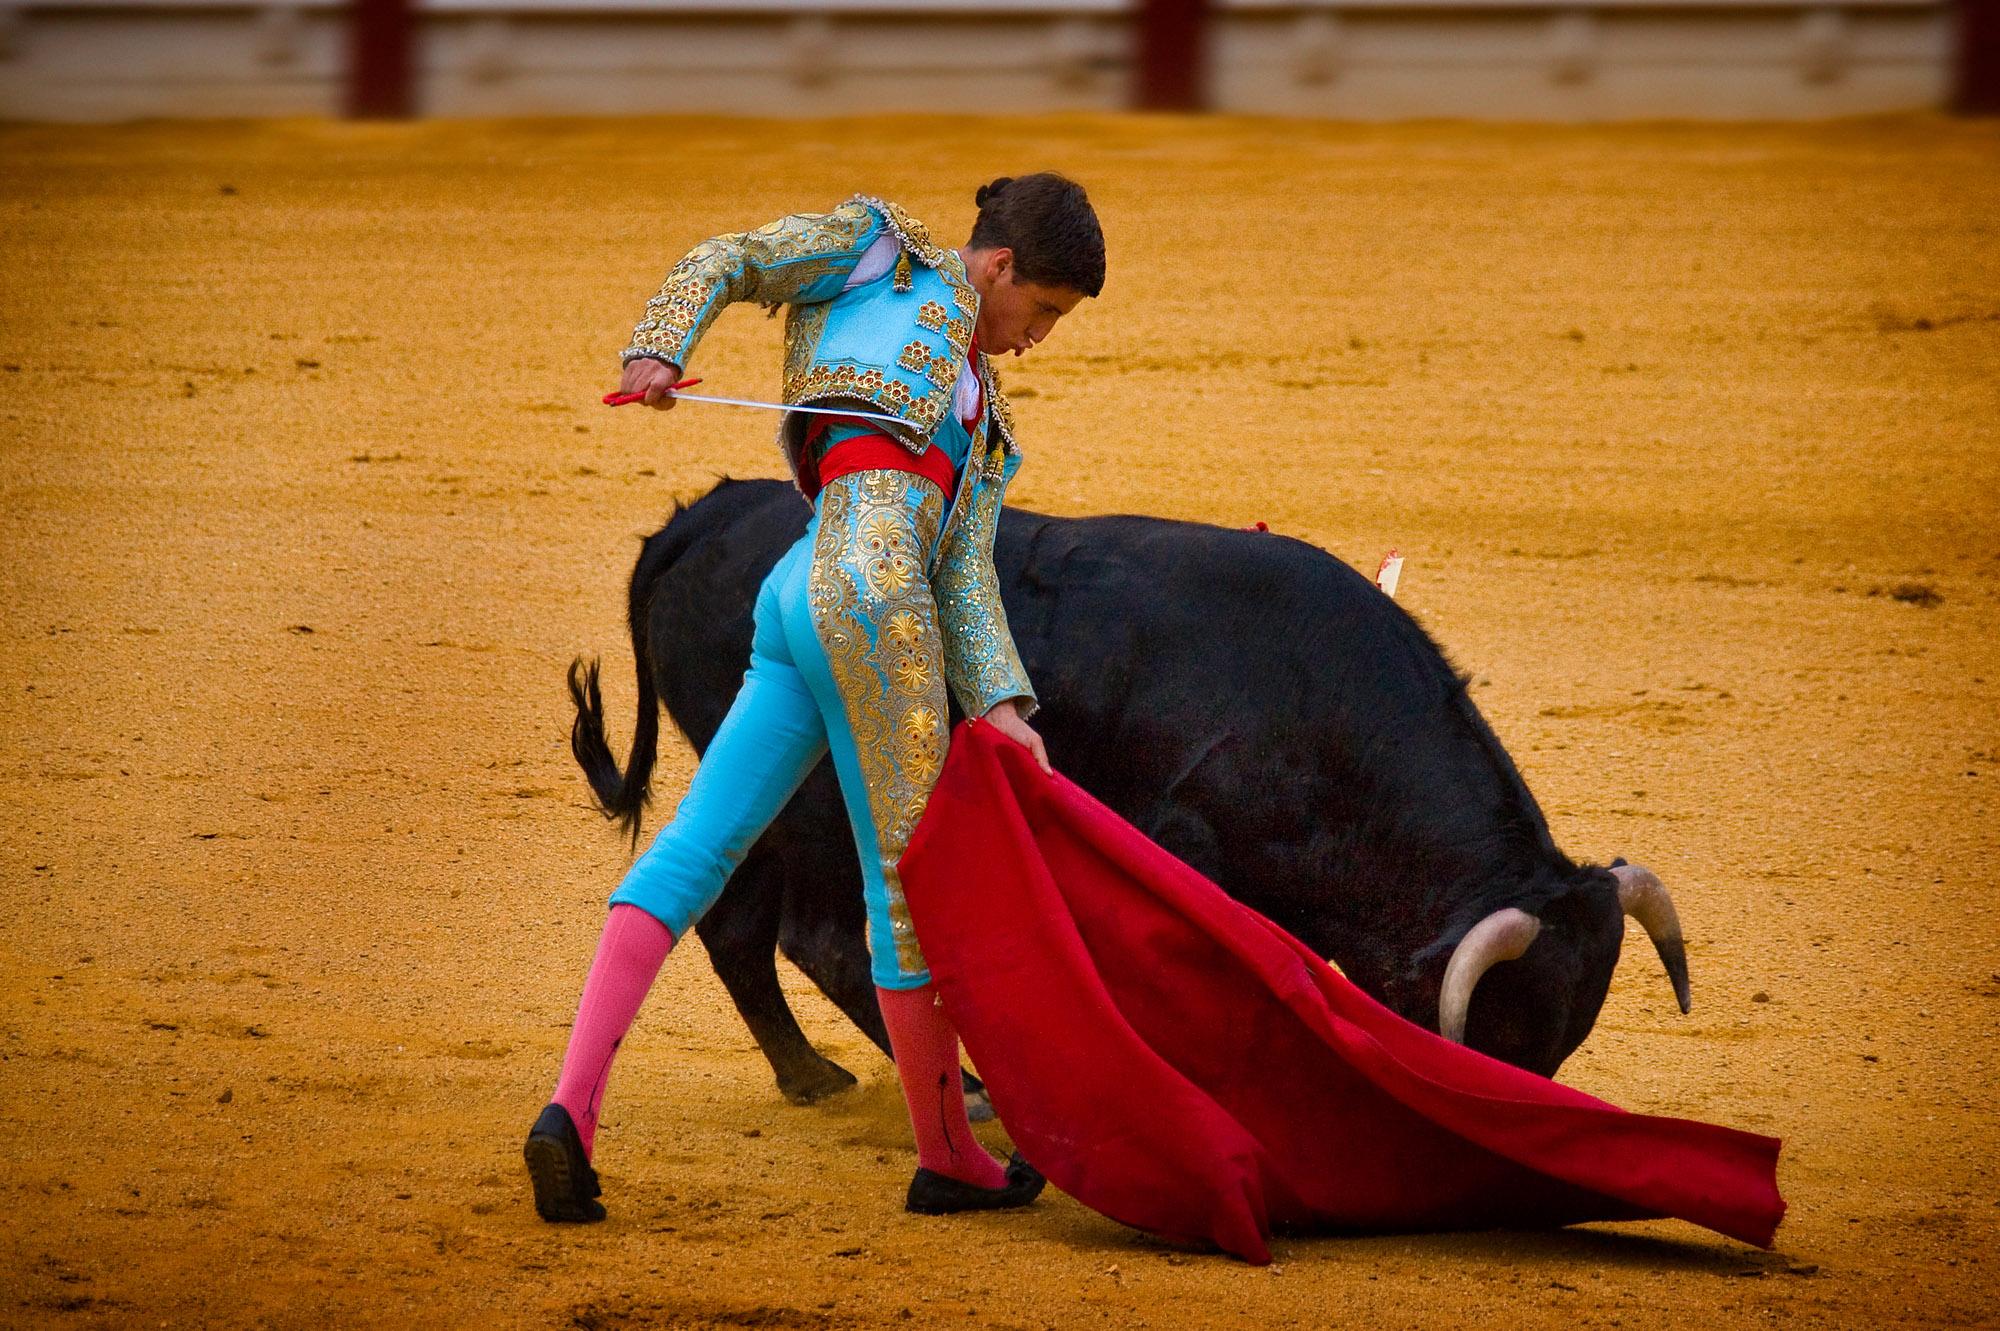 Bullfighting in a Hostile Age